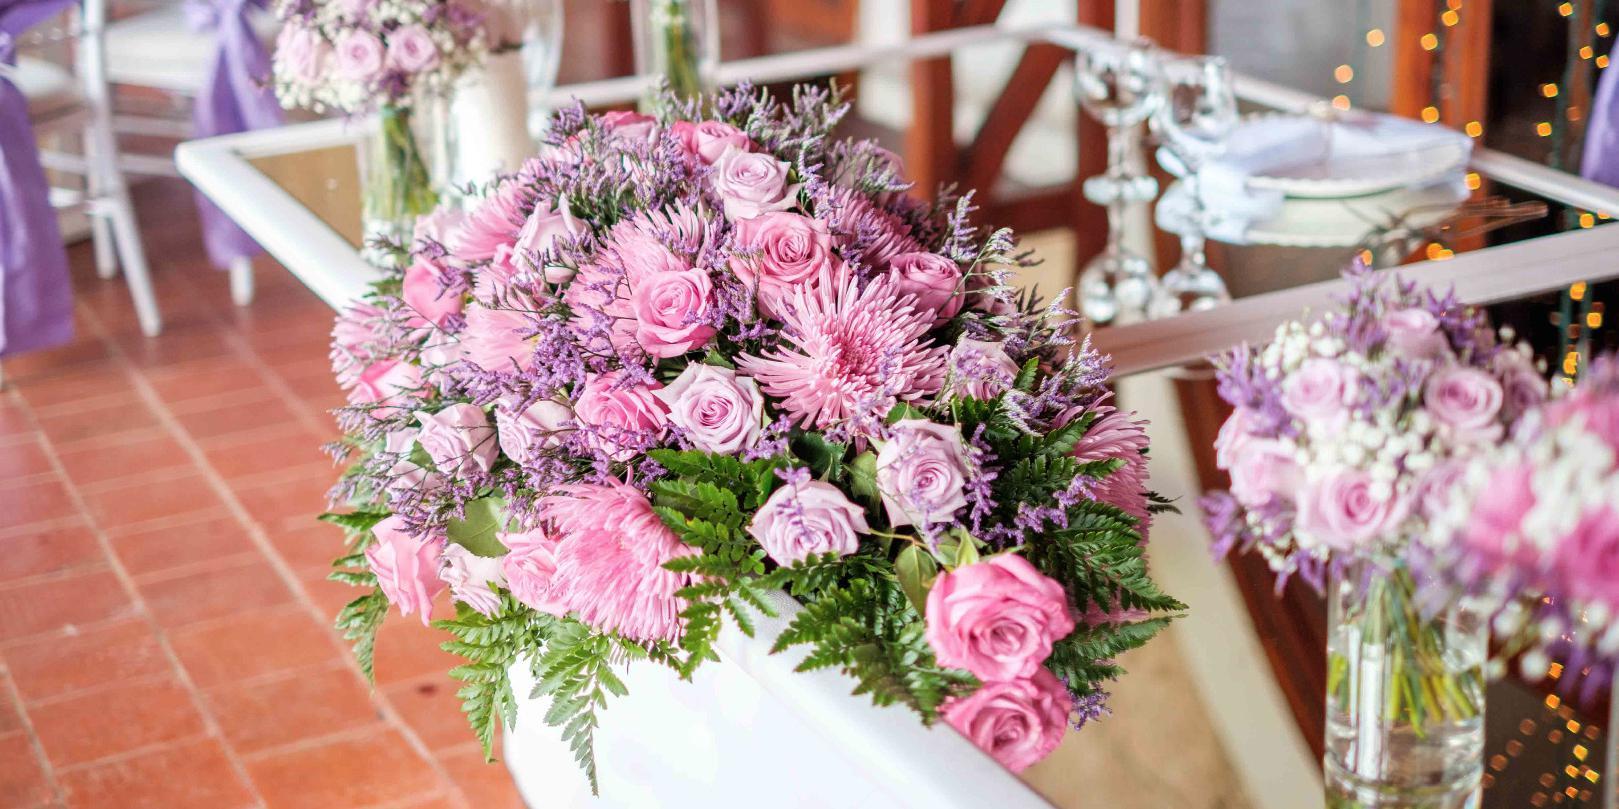 bodas-sin-clasificar-sin-tema-cuba-35821.jpg